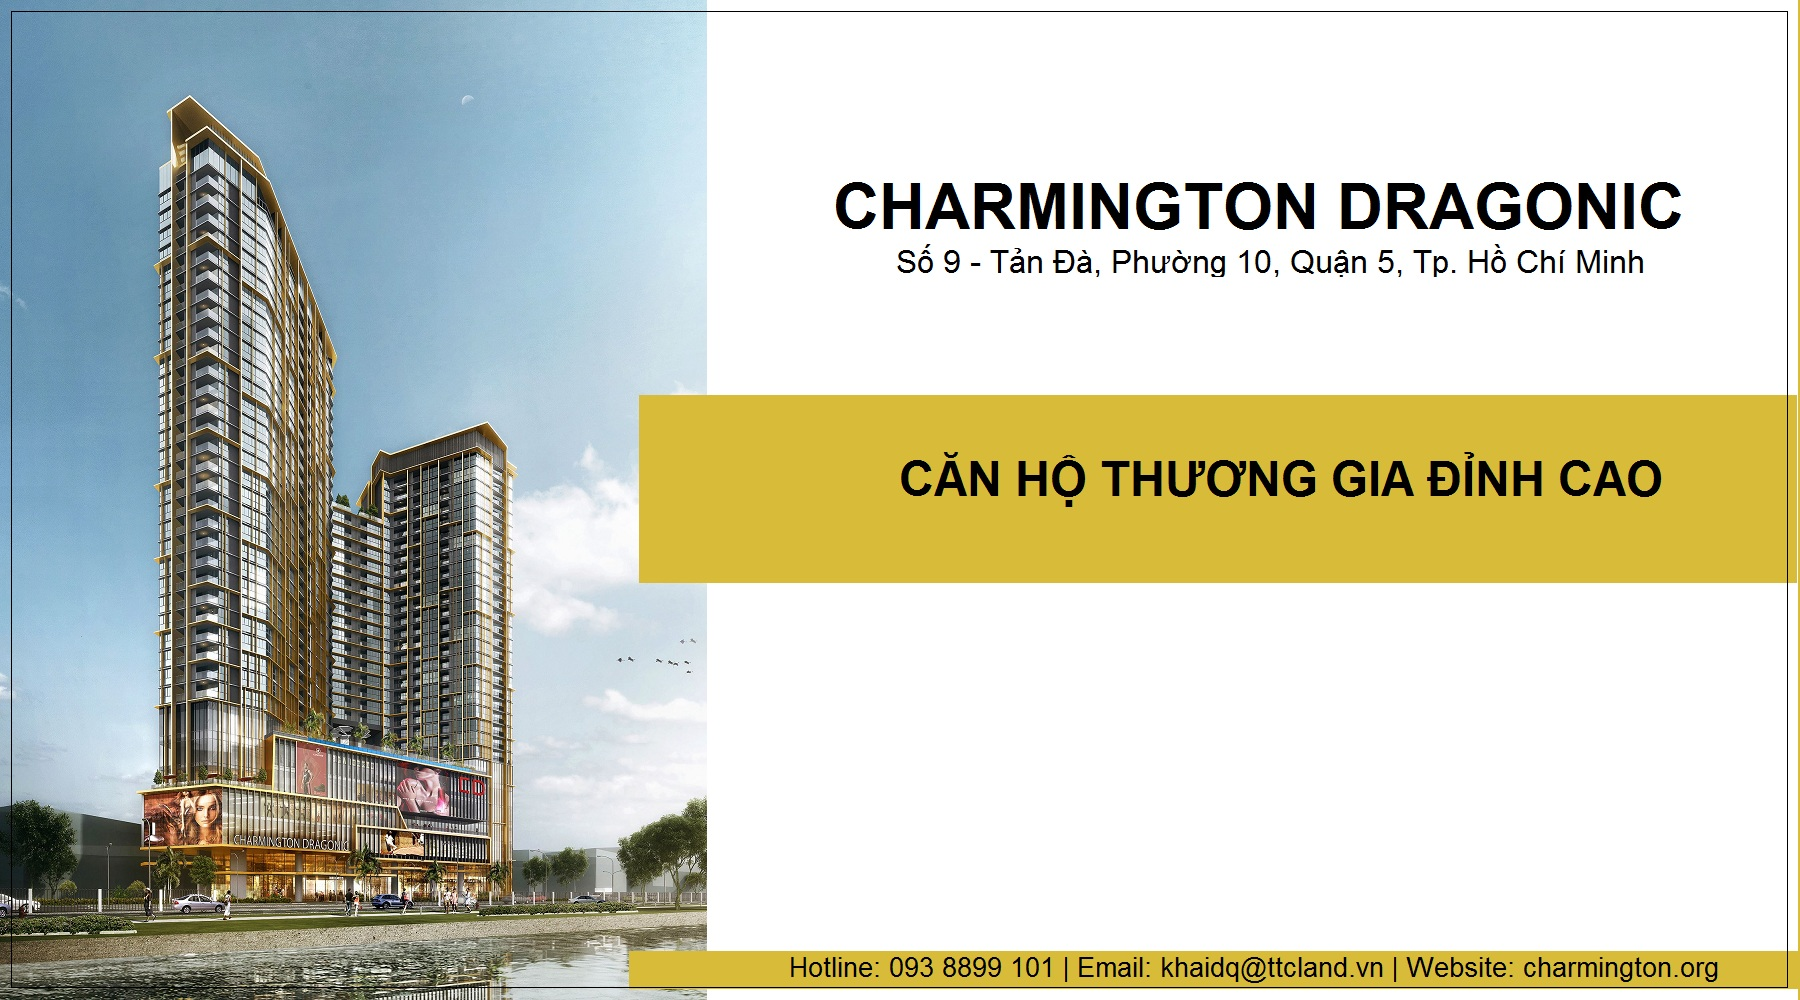 https://charmington.org/public/upload/phoi-canh-charmington-dragonic-charmingtonorg-1553078708.jpg